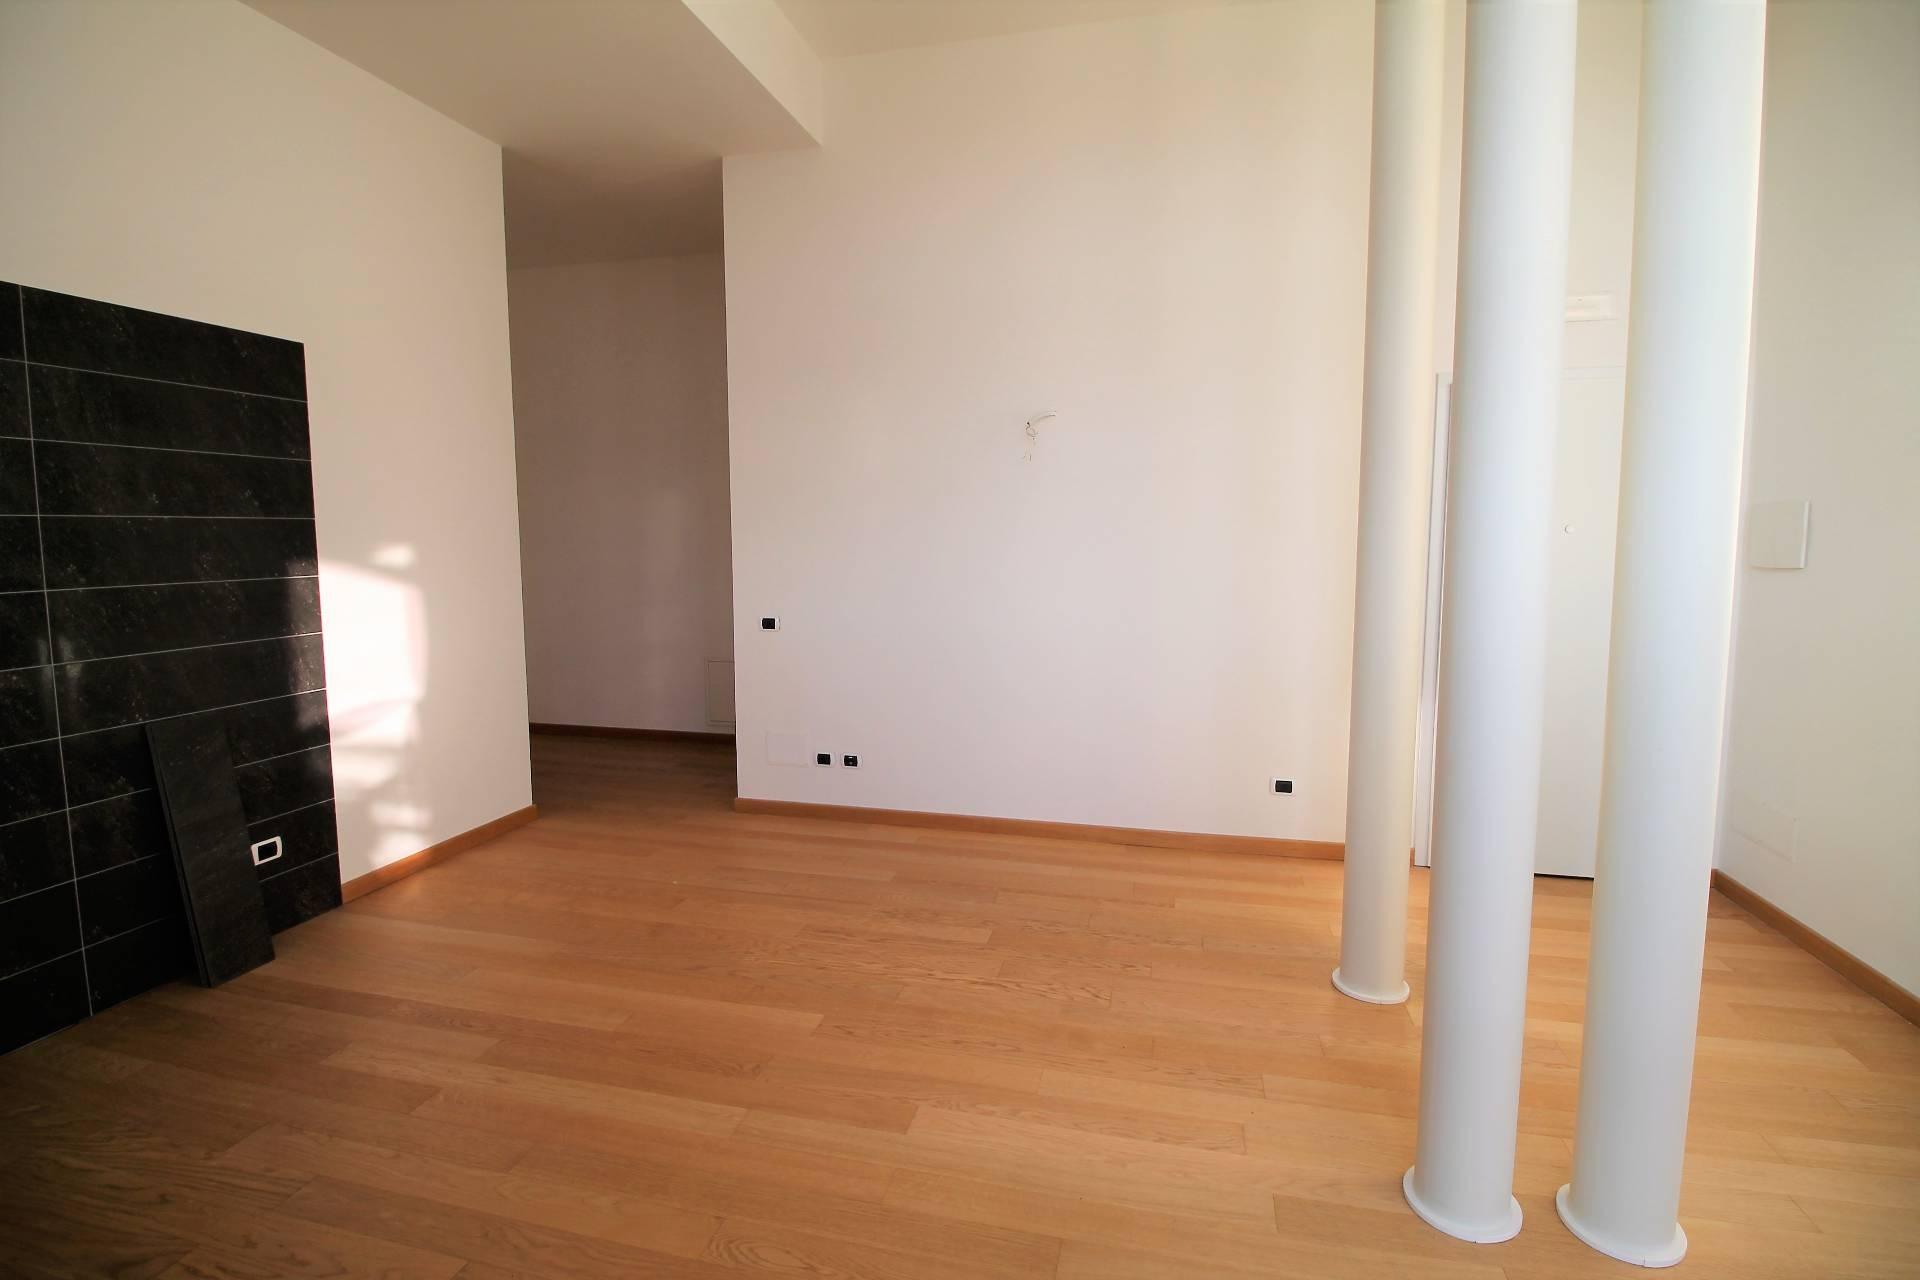 Appartamento in vendita, rif. V1215B